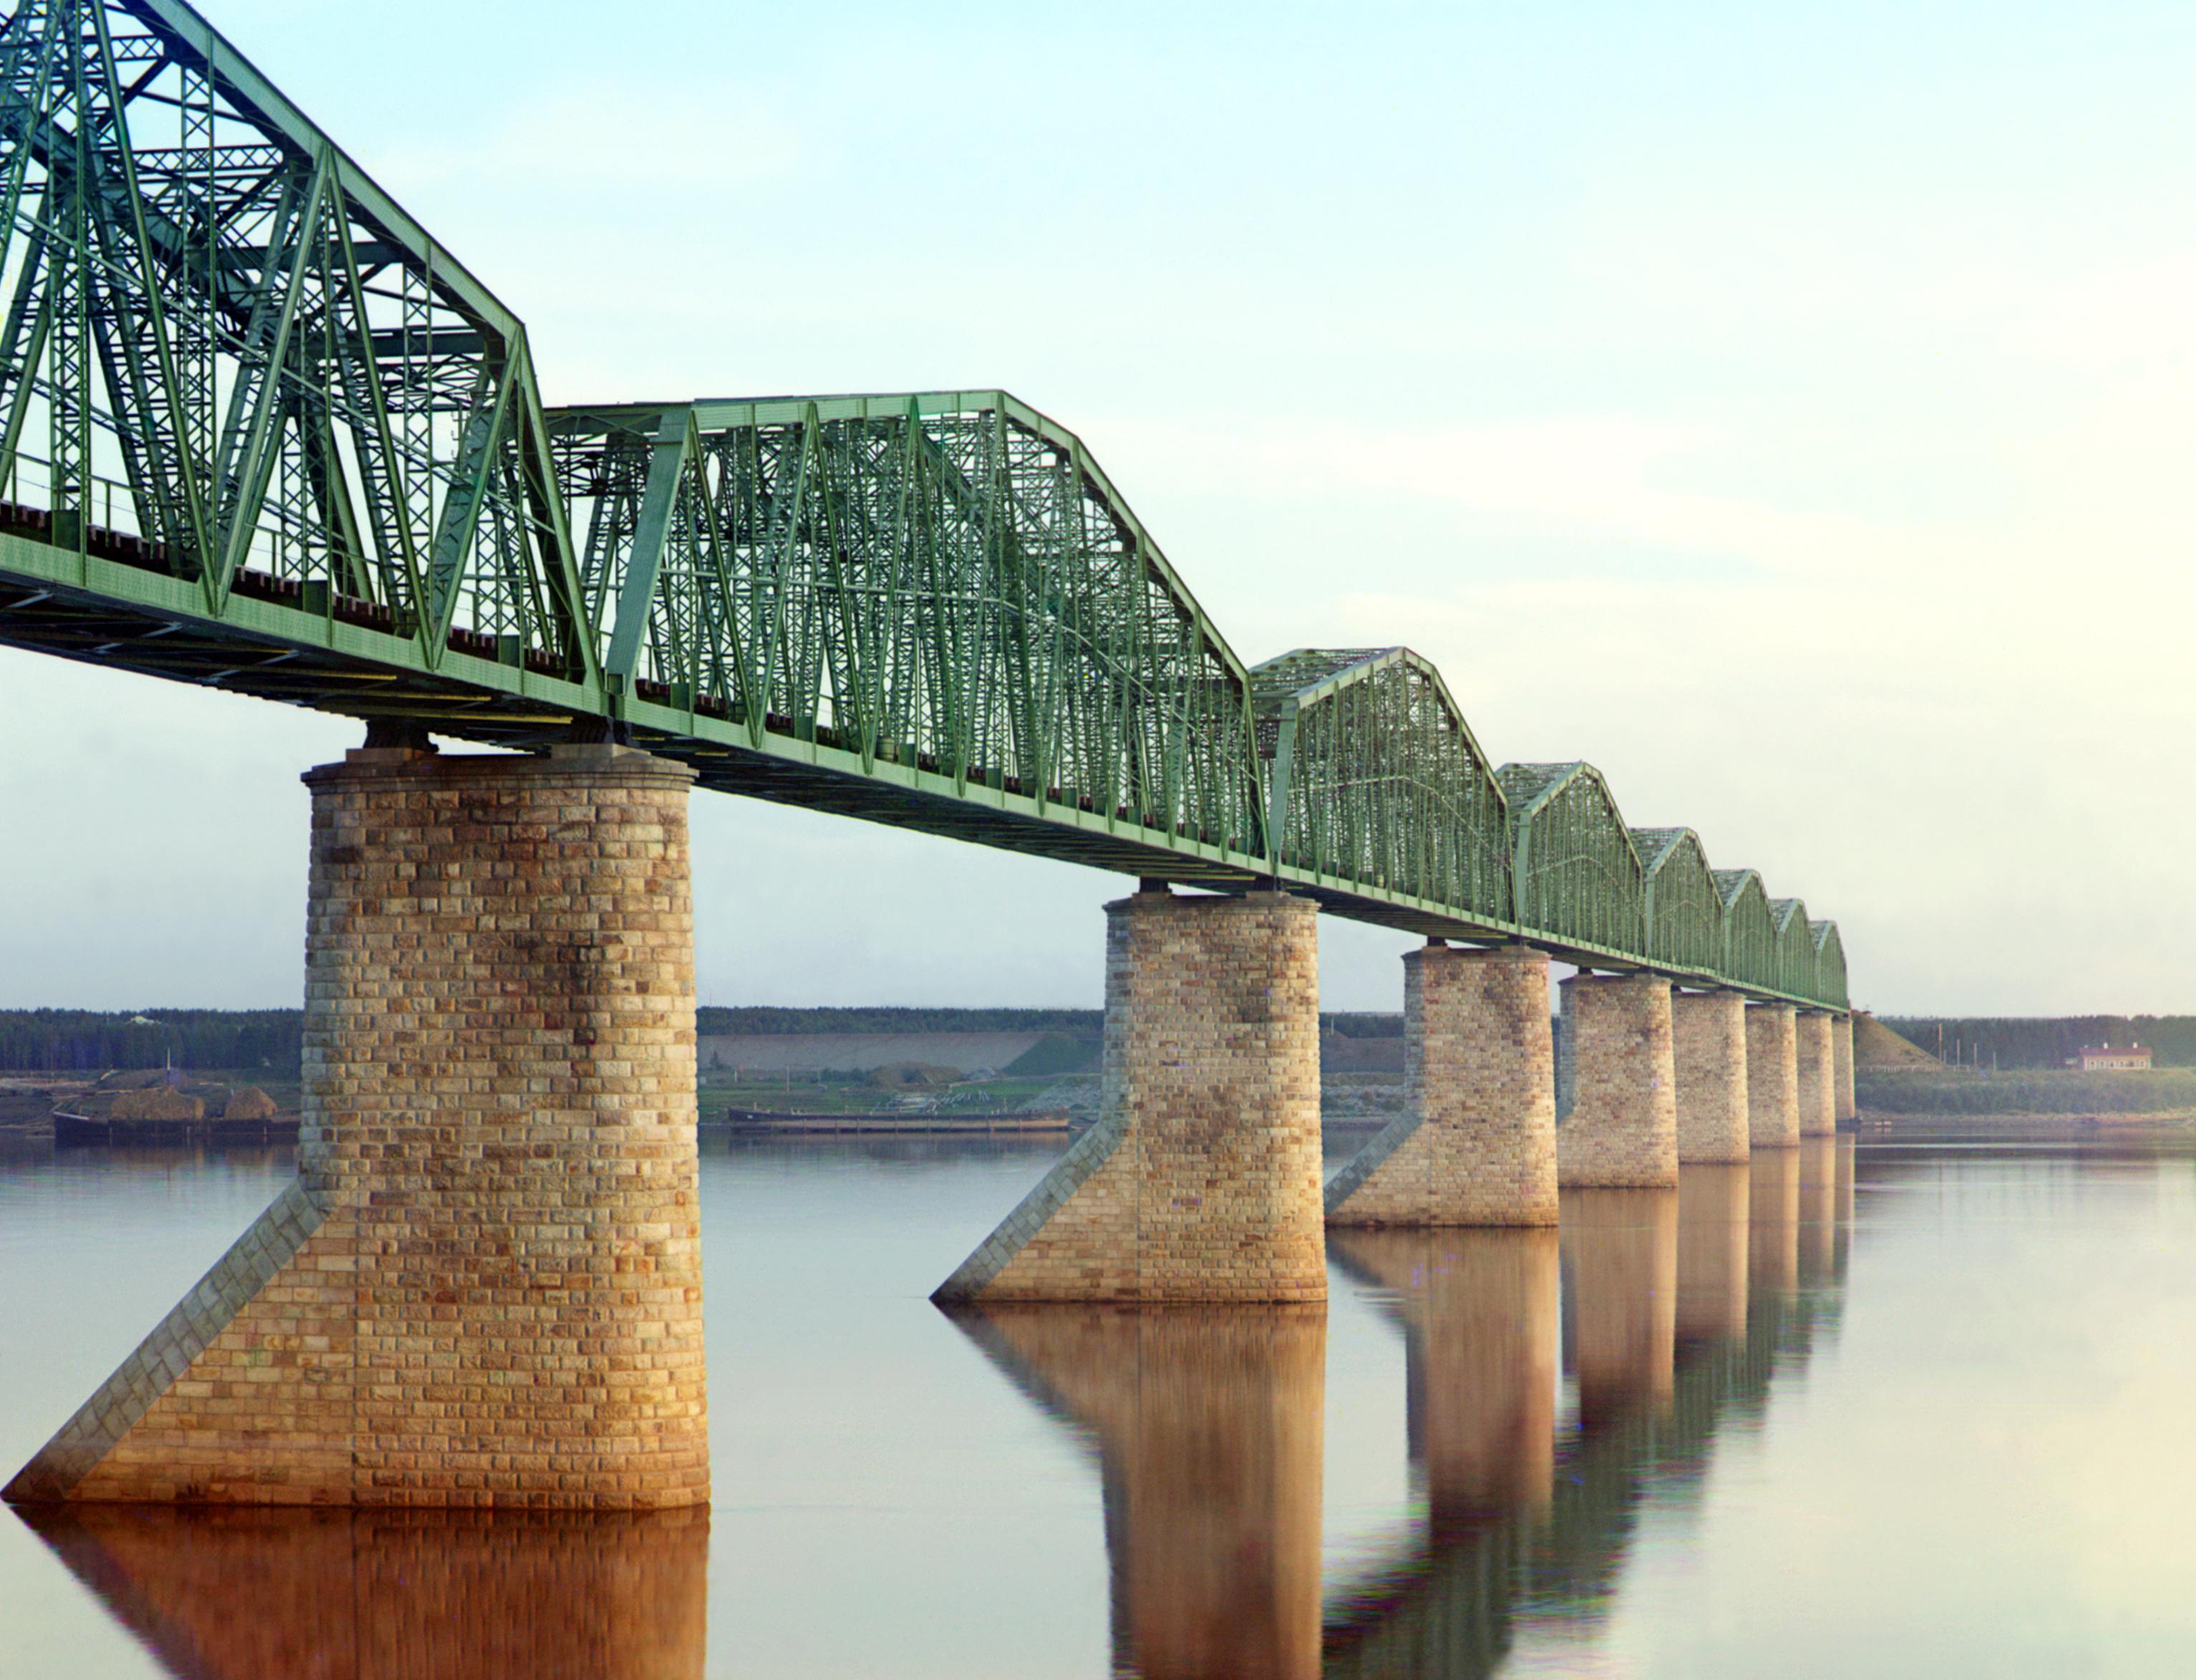 Transsibirische Eisenbahn (http://commons.wikimedia.org/wiki/File:Prokudin-Gorskii-25.jpg)